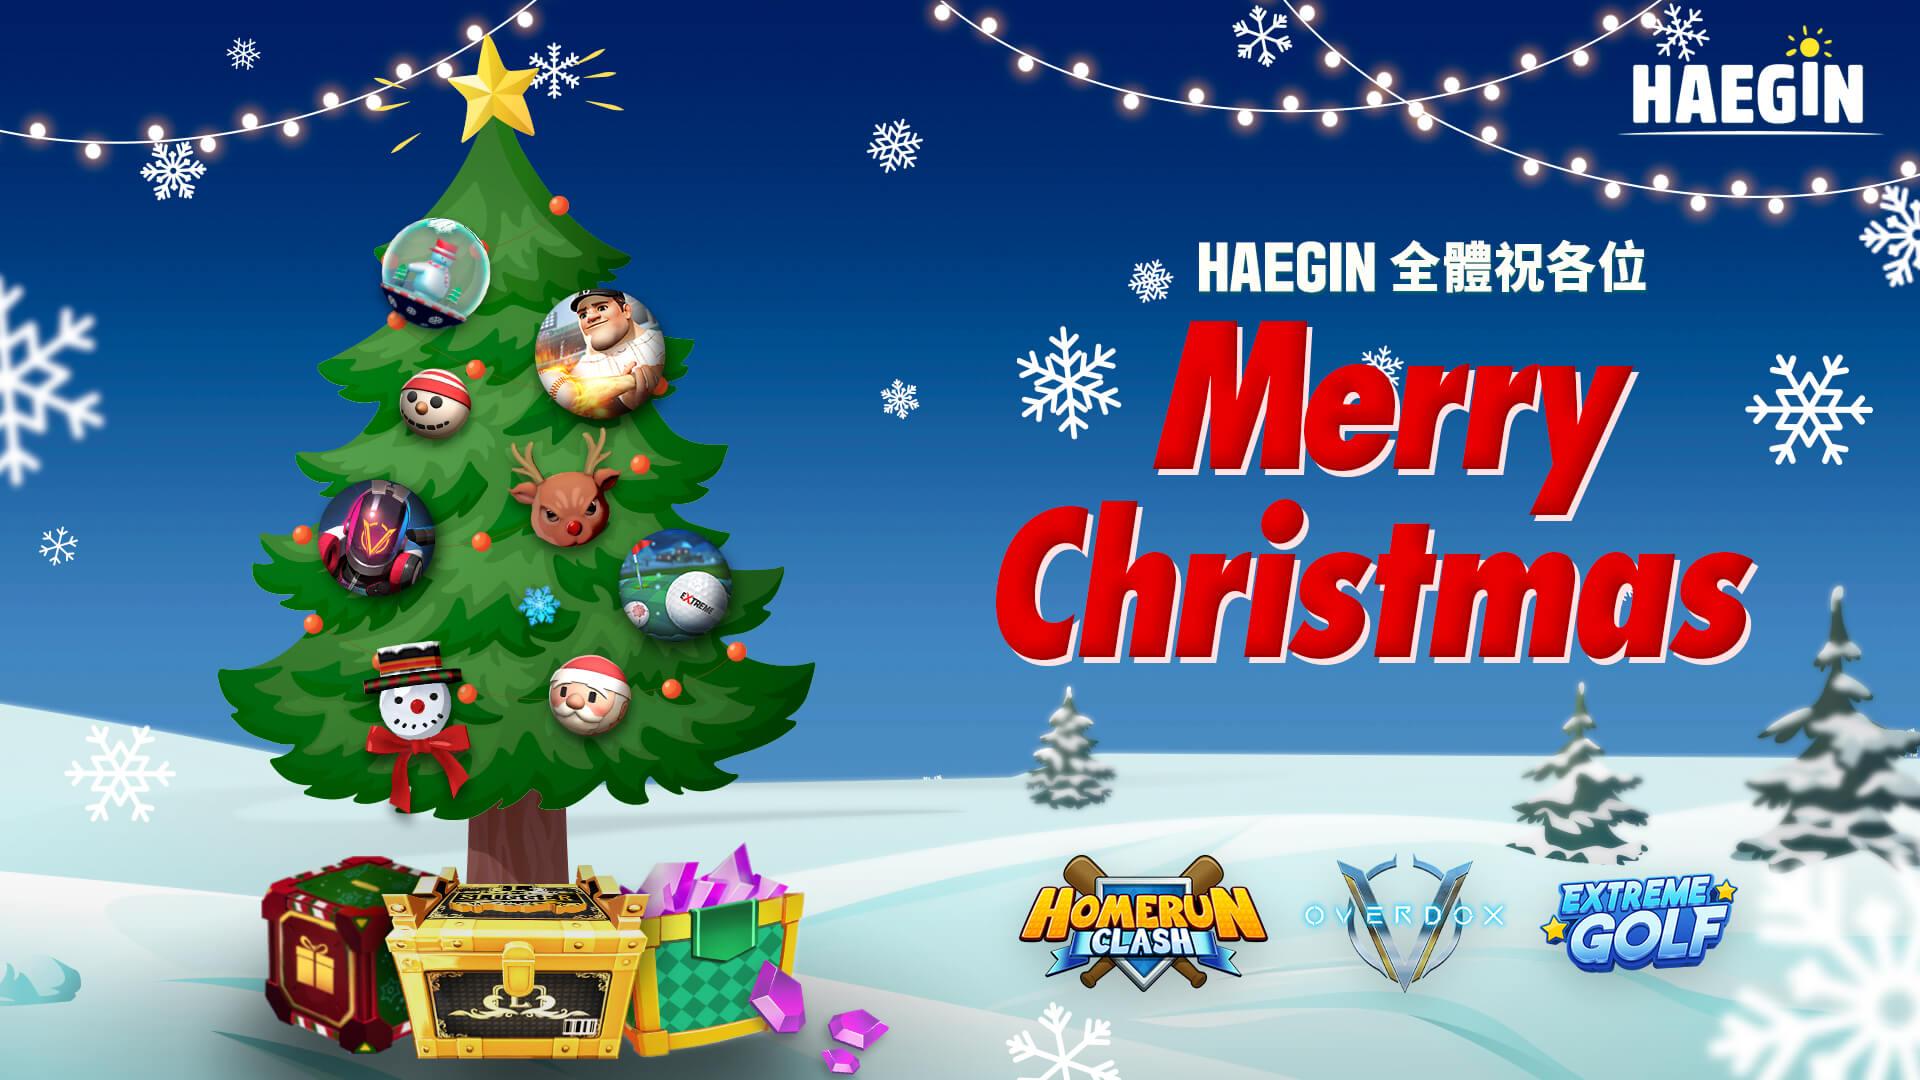 HAEGIN旗下3種手游進行改版同時進行聖誕節紀念活動